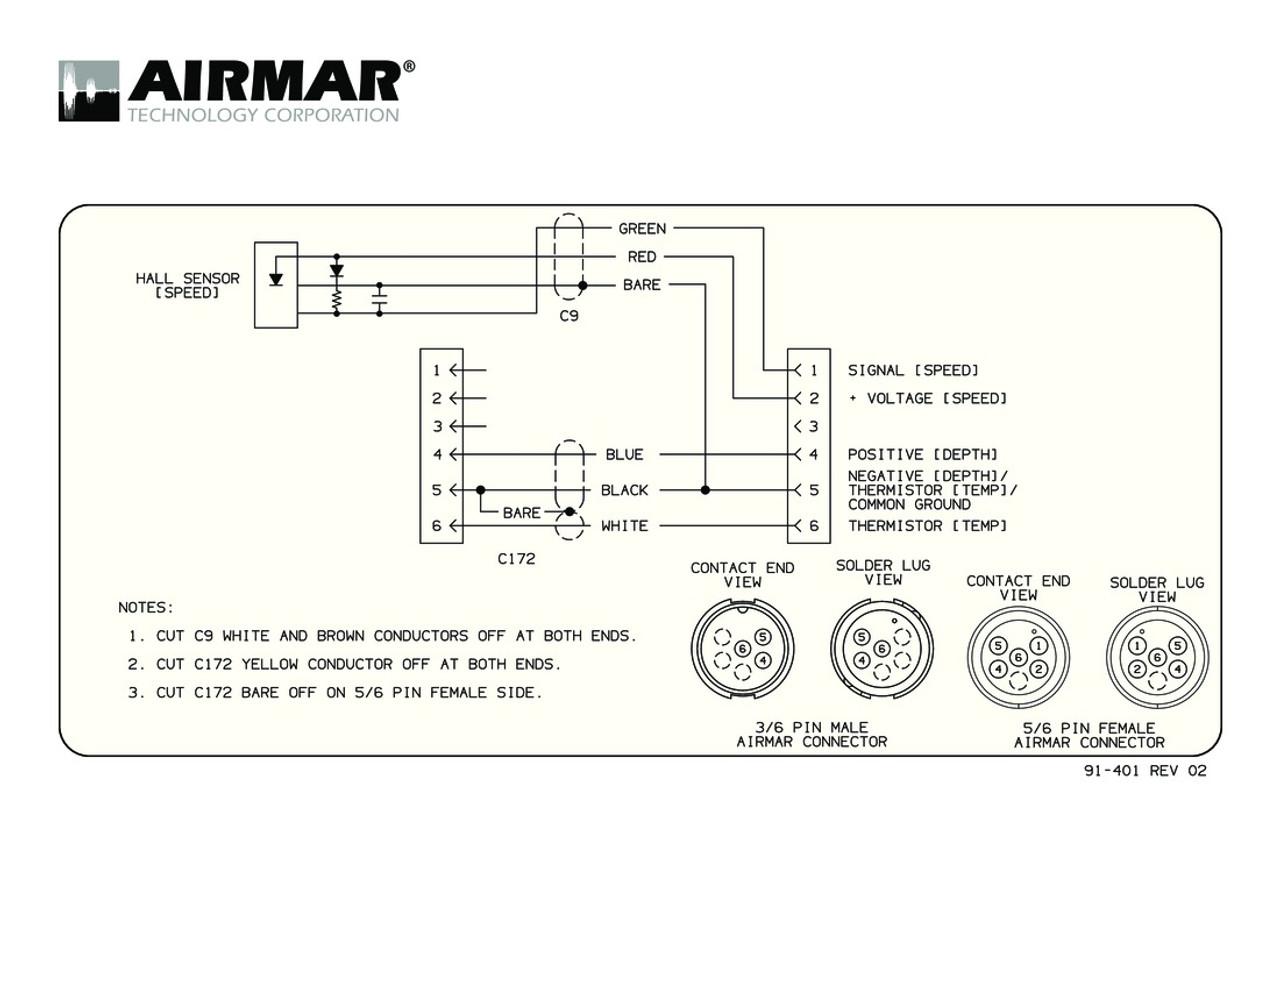 small resolution of airmar wiring diagram garmin 6 pin s blue bottle marine transducer wiring diagram transducer wiring diagram